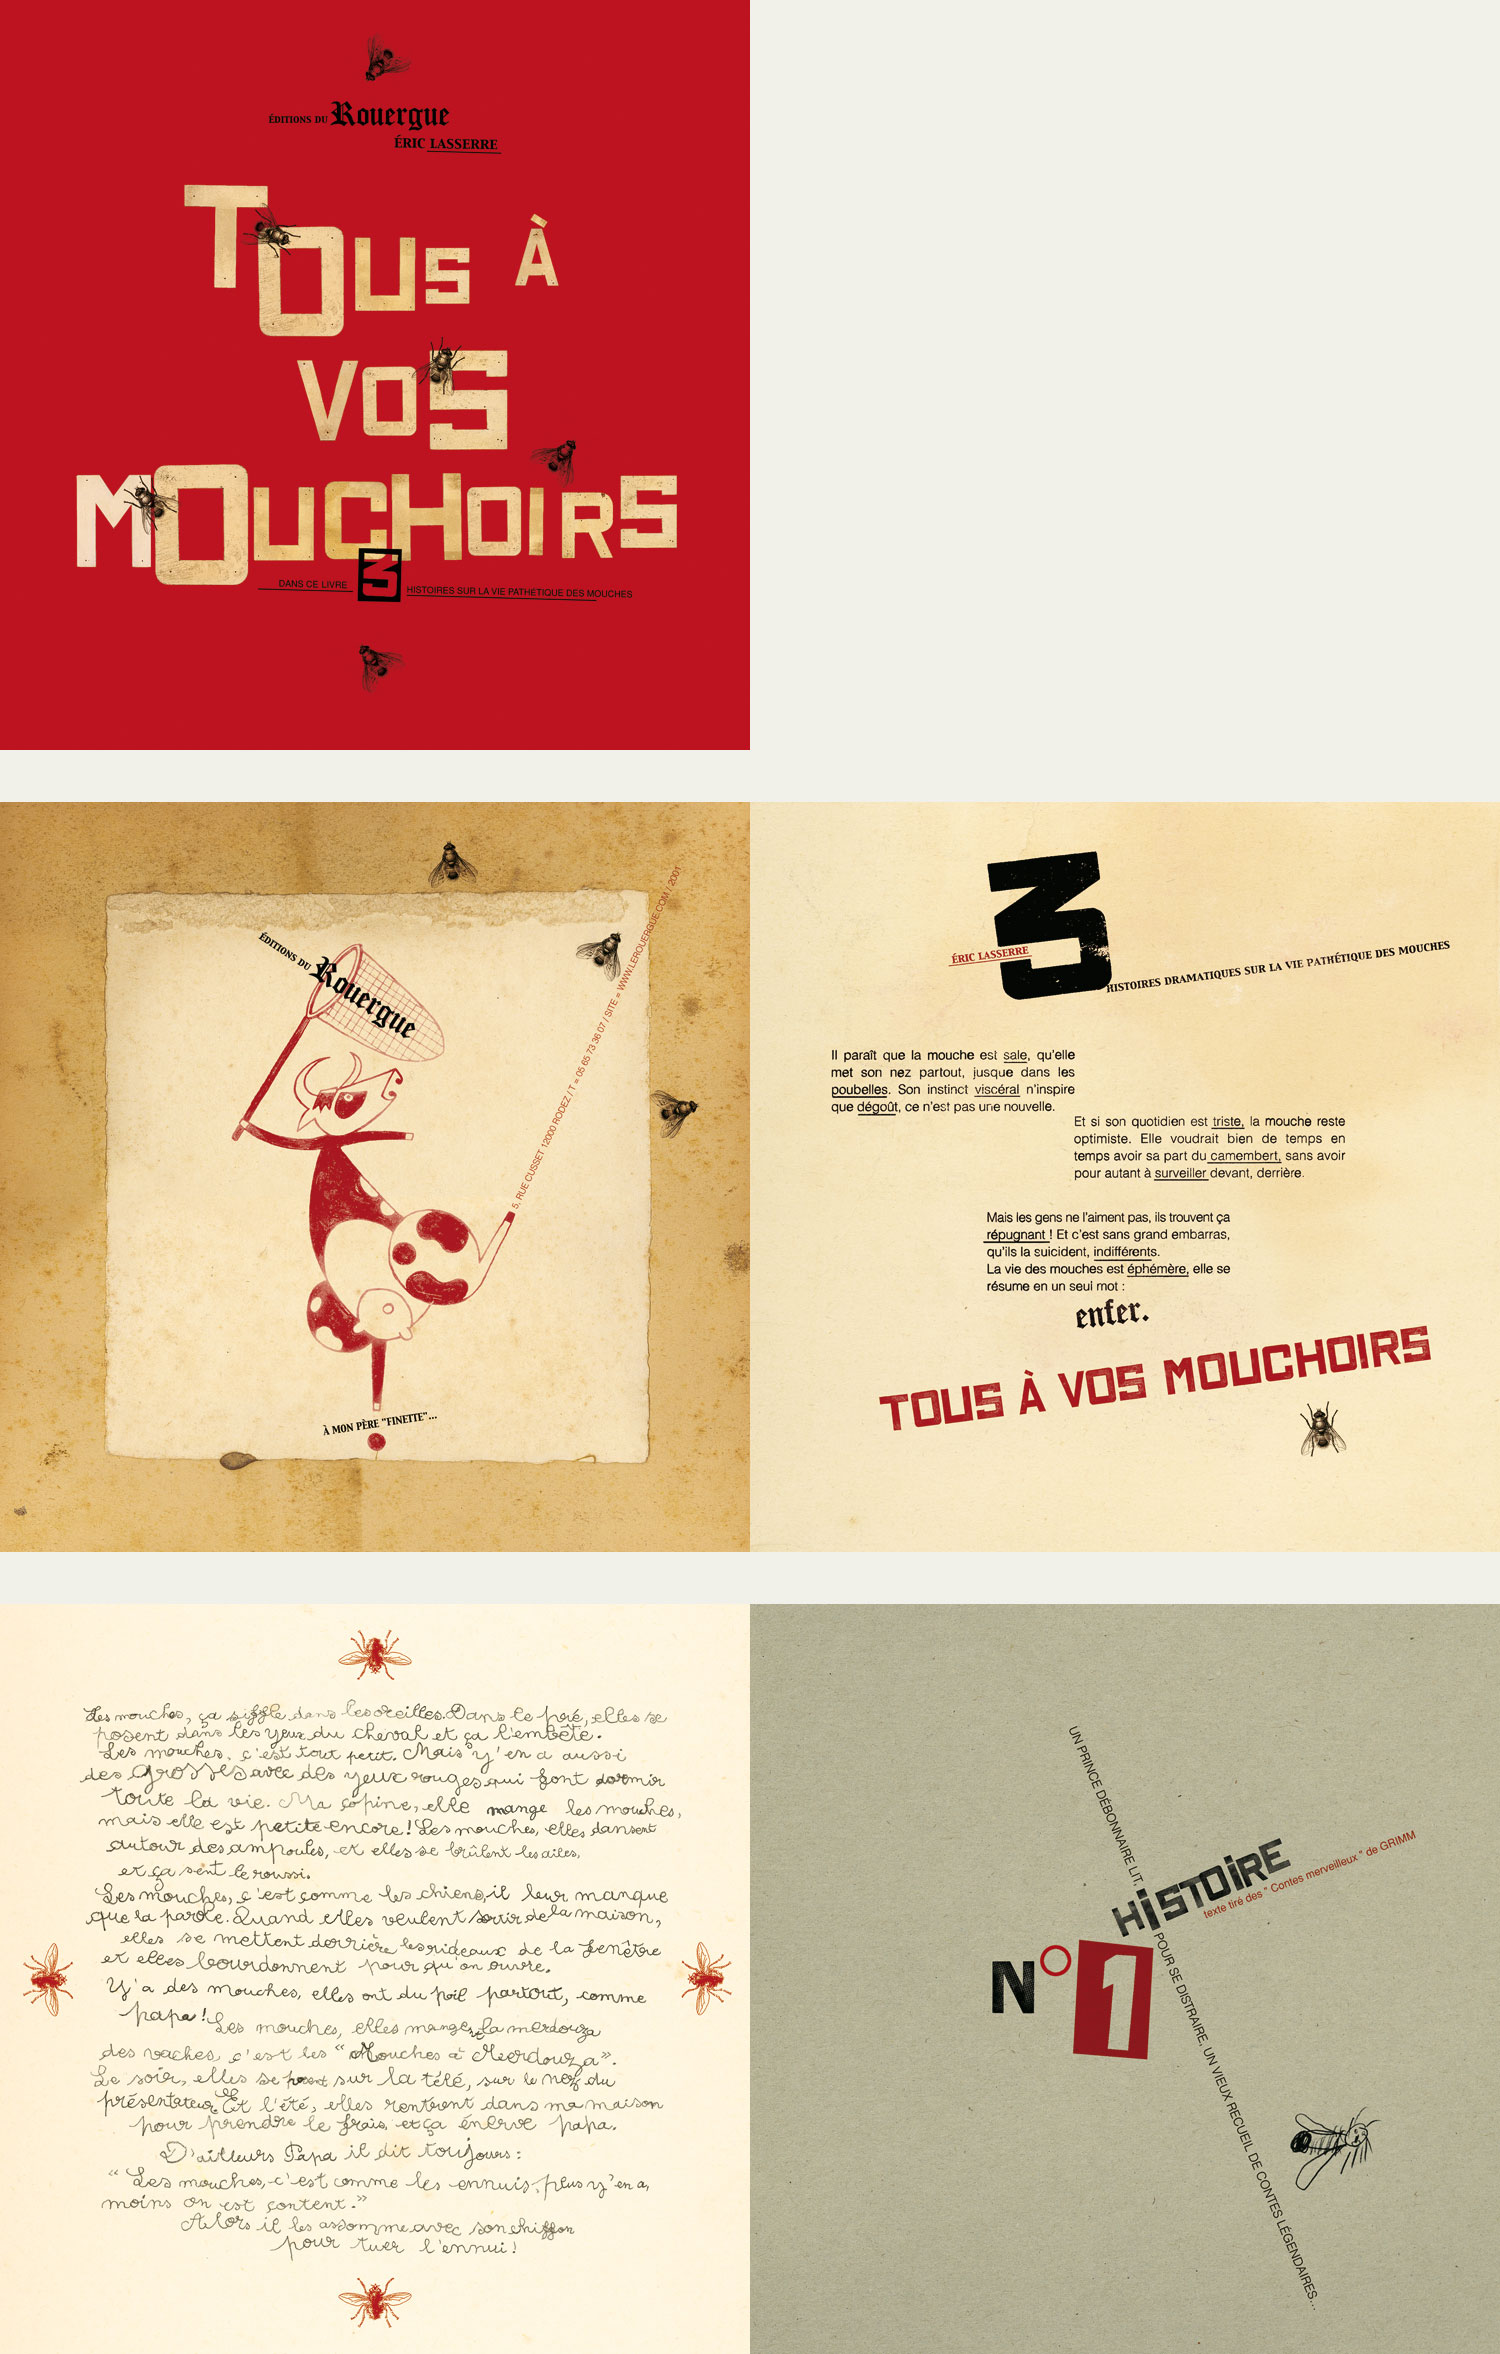 MrThornill-edition-tous-a-vos-mouchoirs-ph1